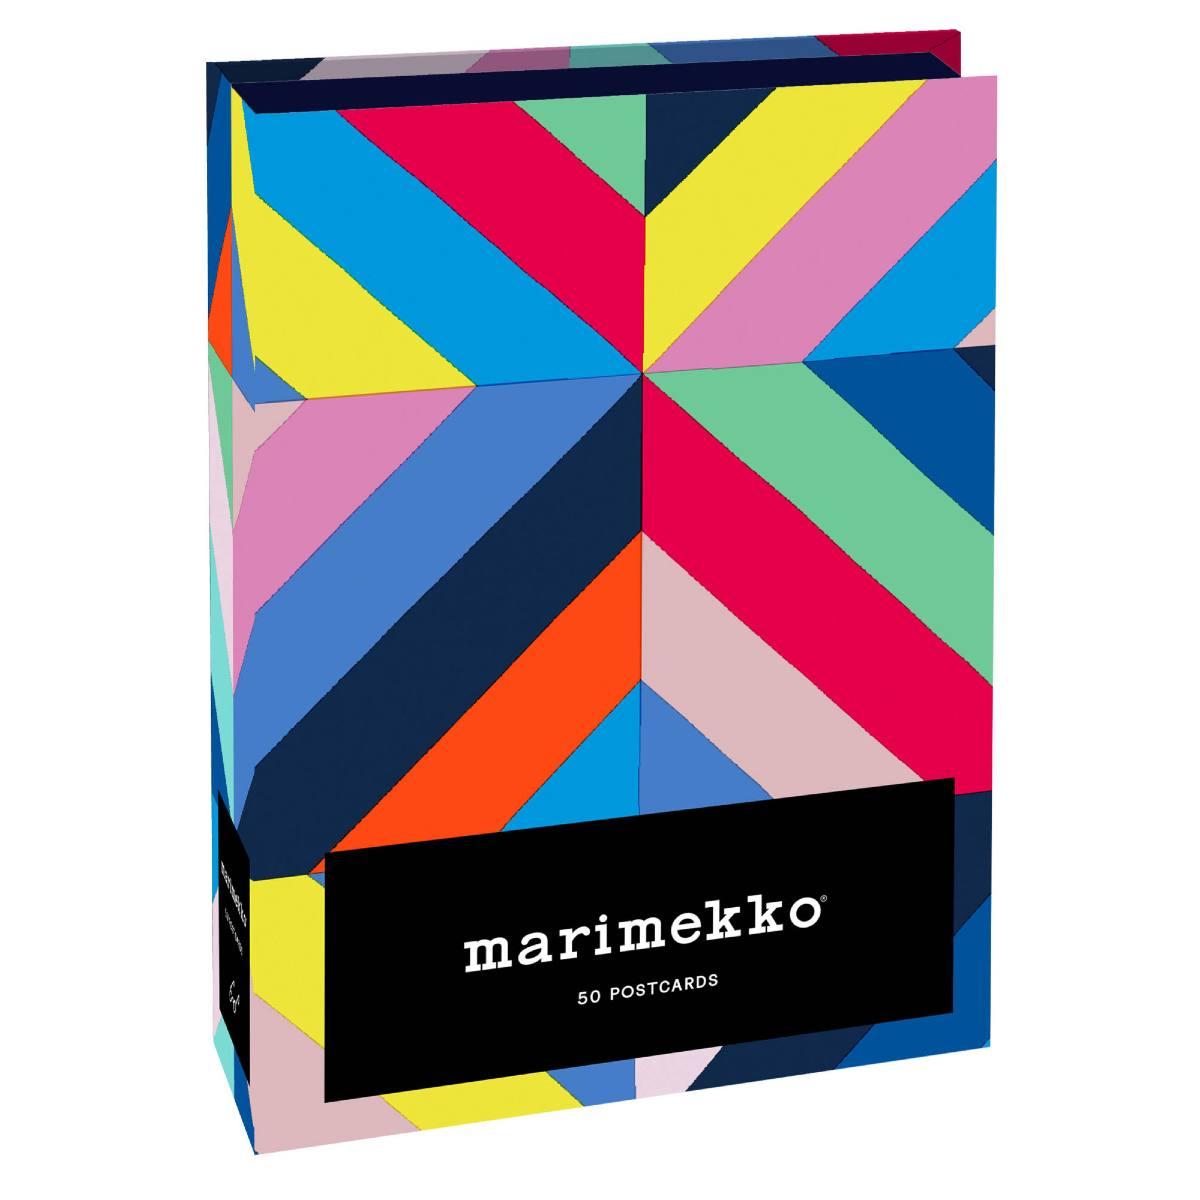 Marimekko 50 Postcards by Abram Chronicle   Restoration Yard